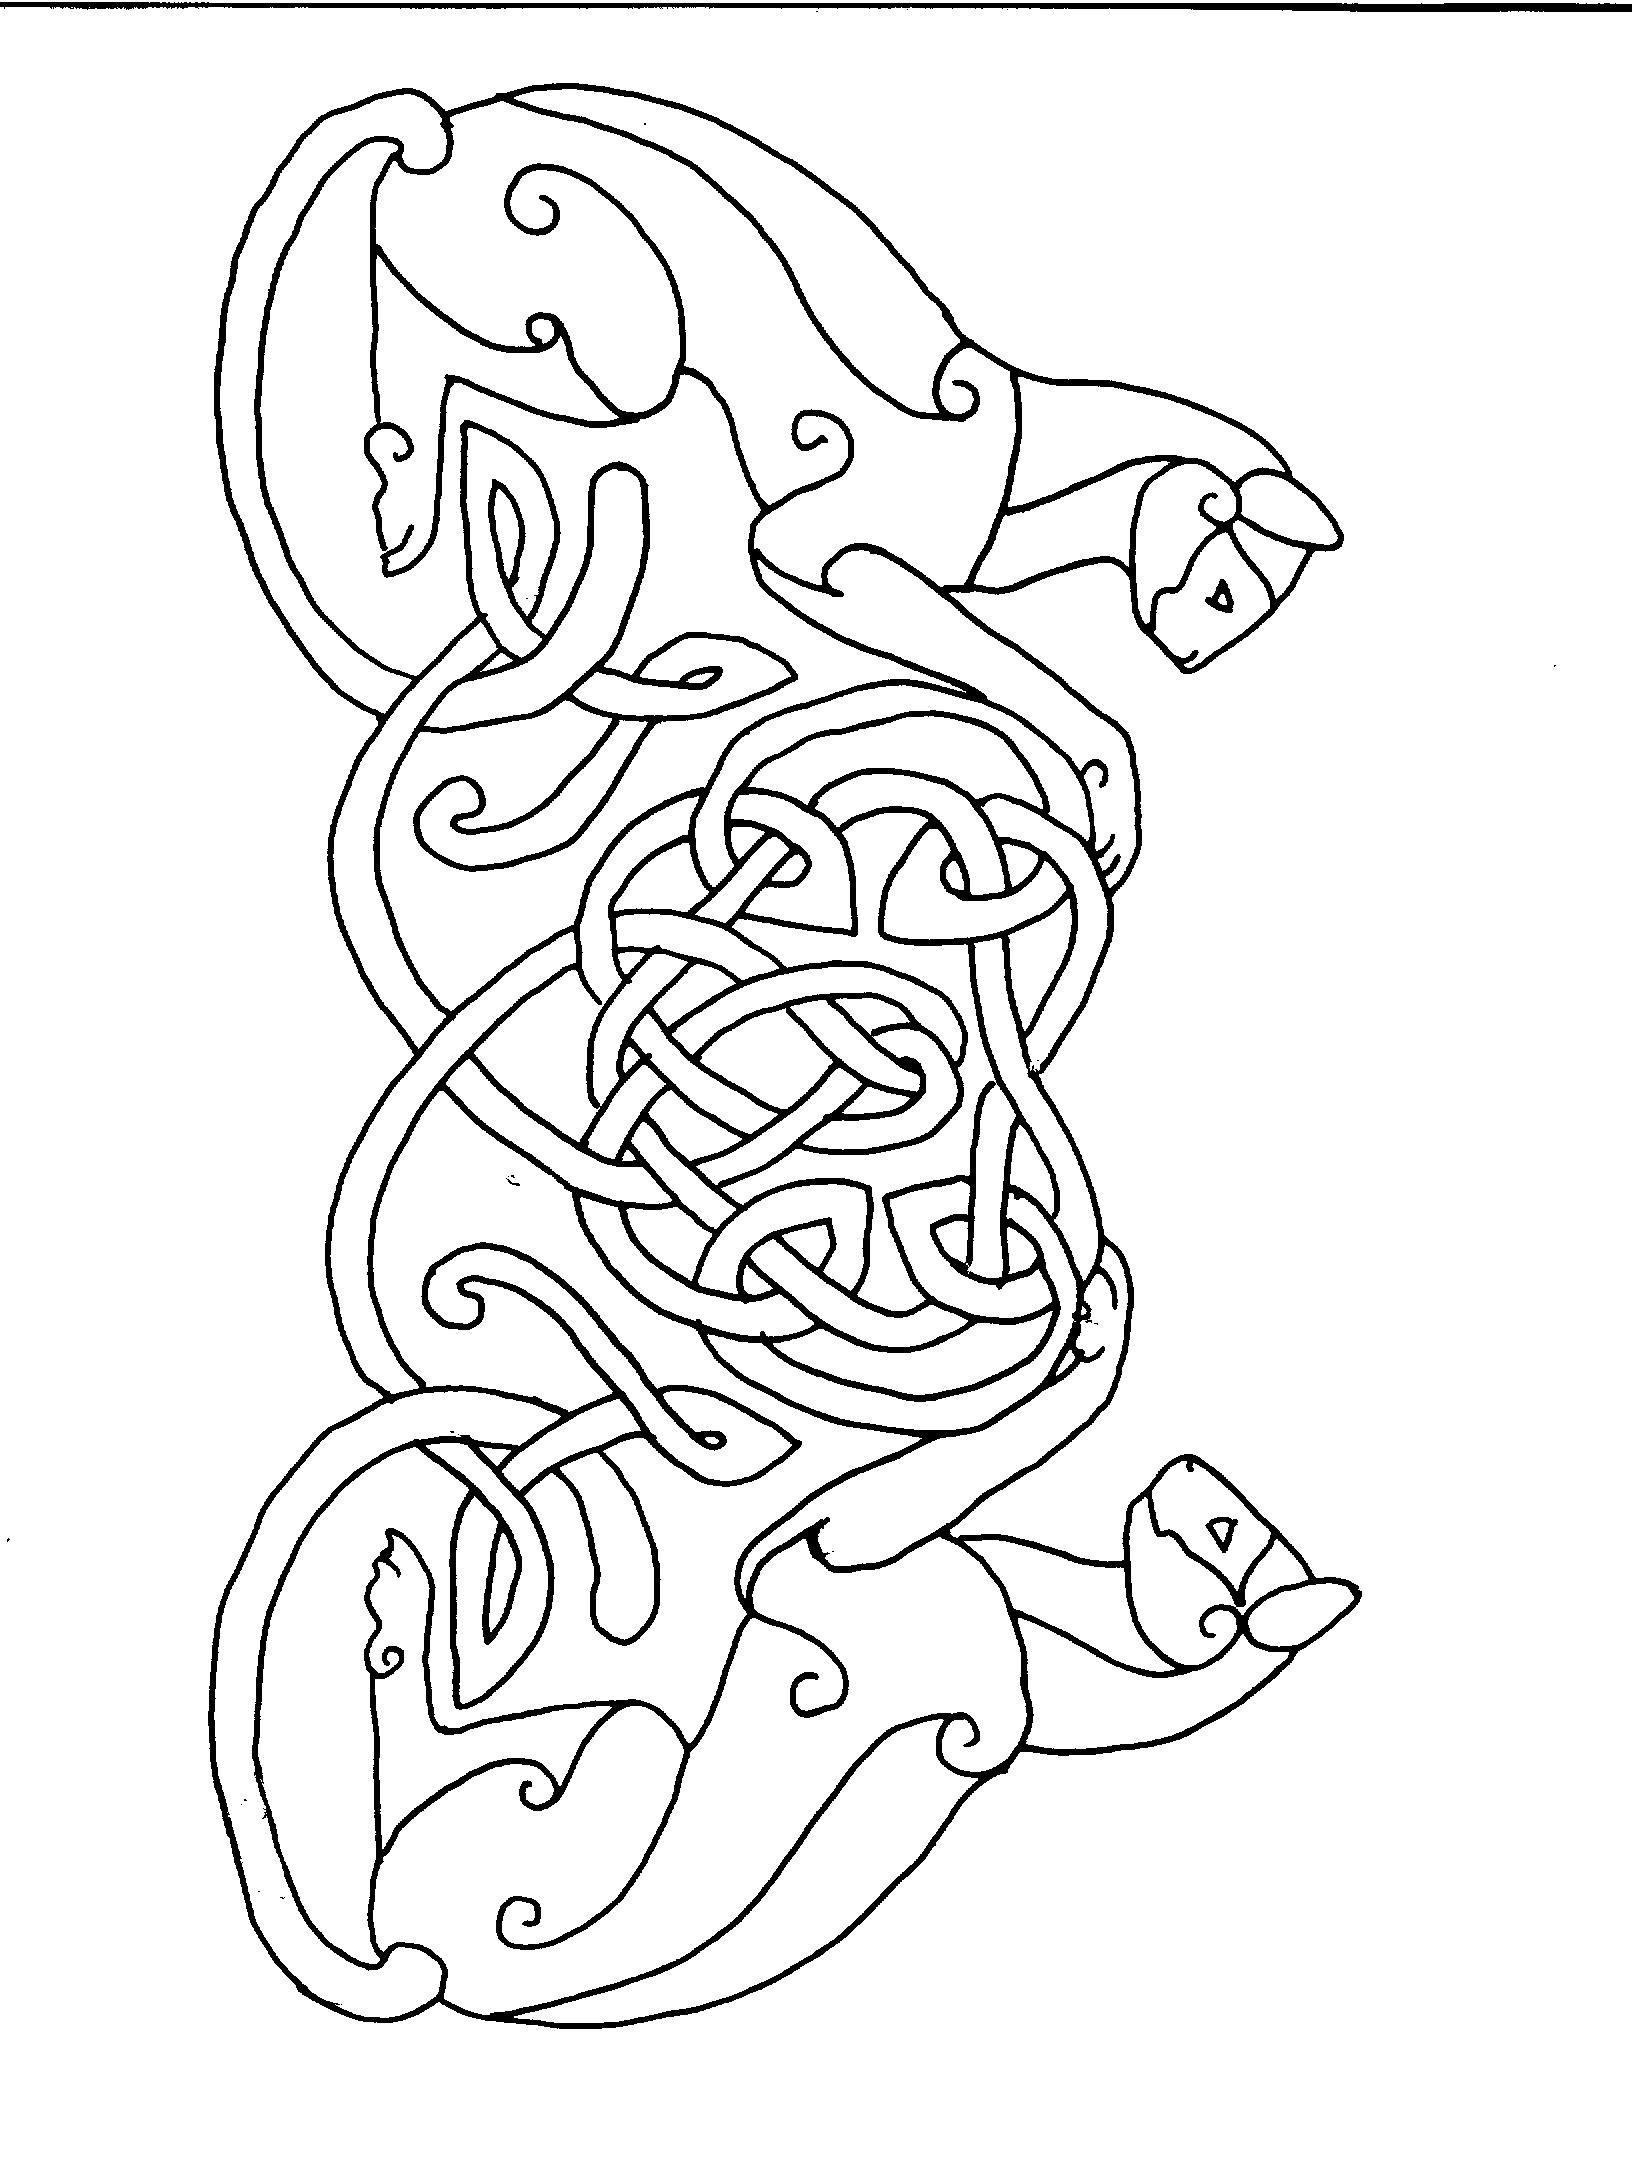 cat celtic coloring pages - photo#5